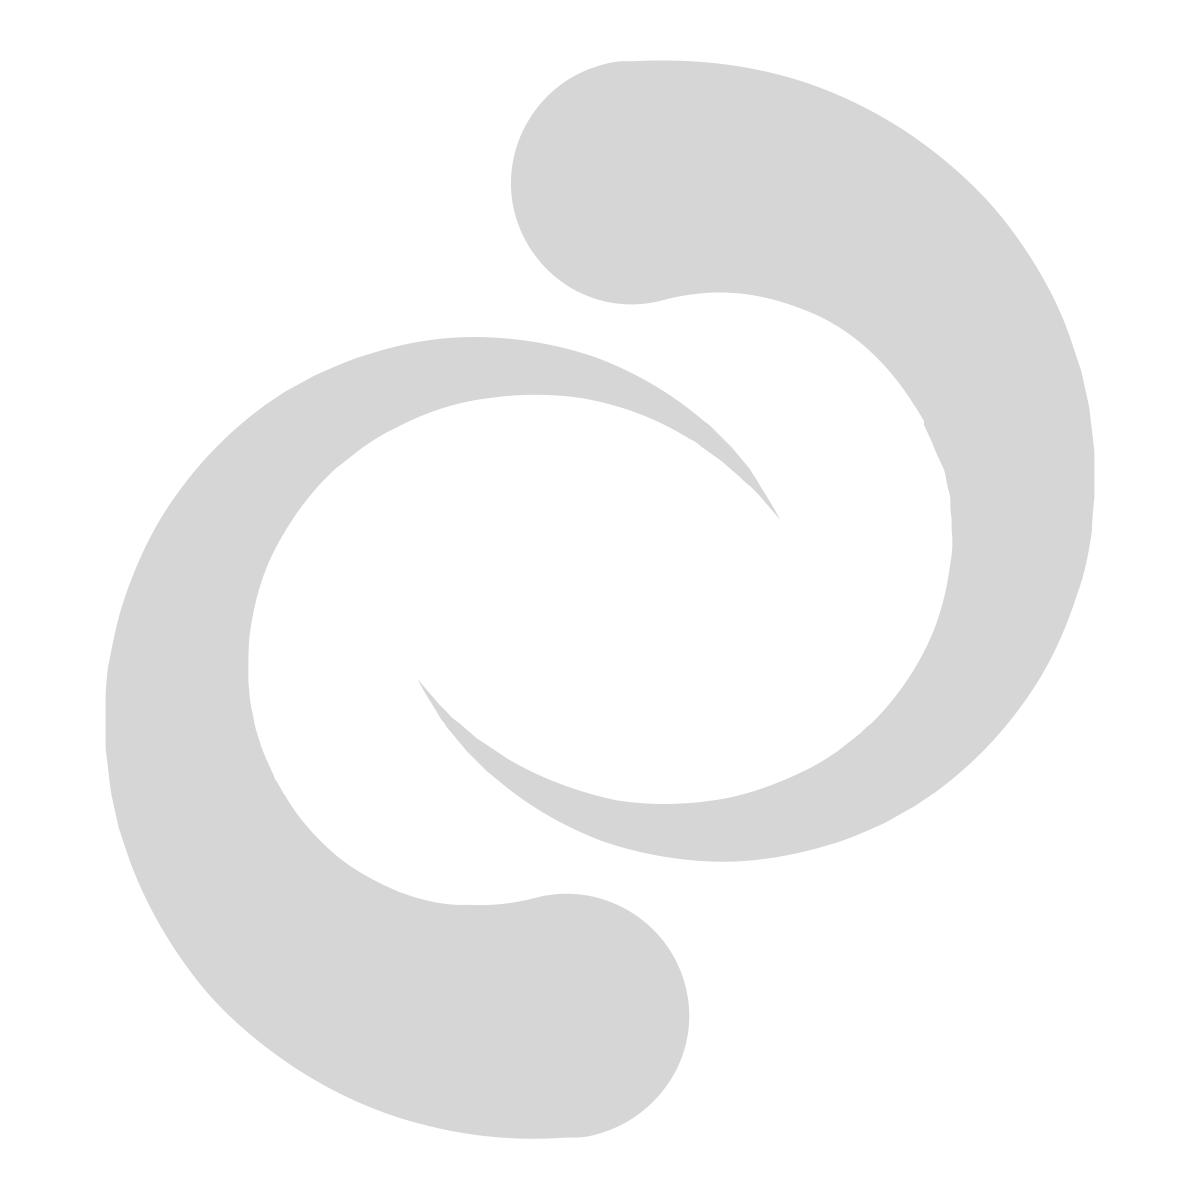 Taiji-grau